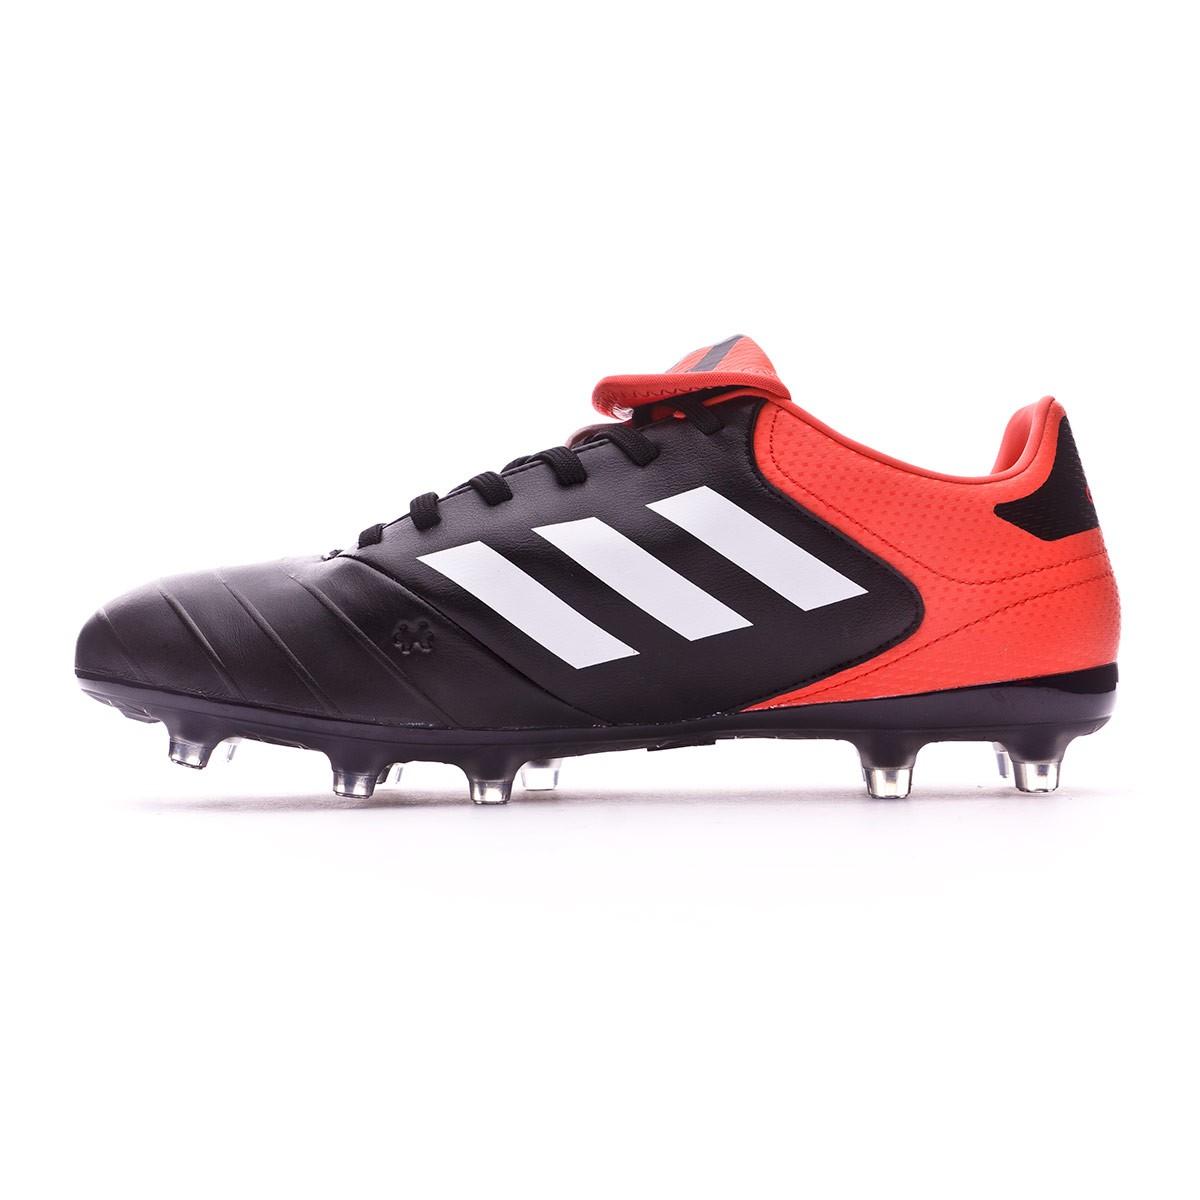 the latest 0a2a3 fa30a CATEGORY. Football Boots · adidas boots